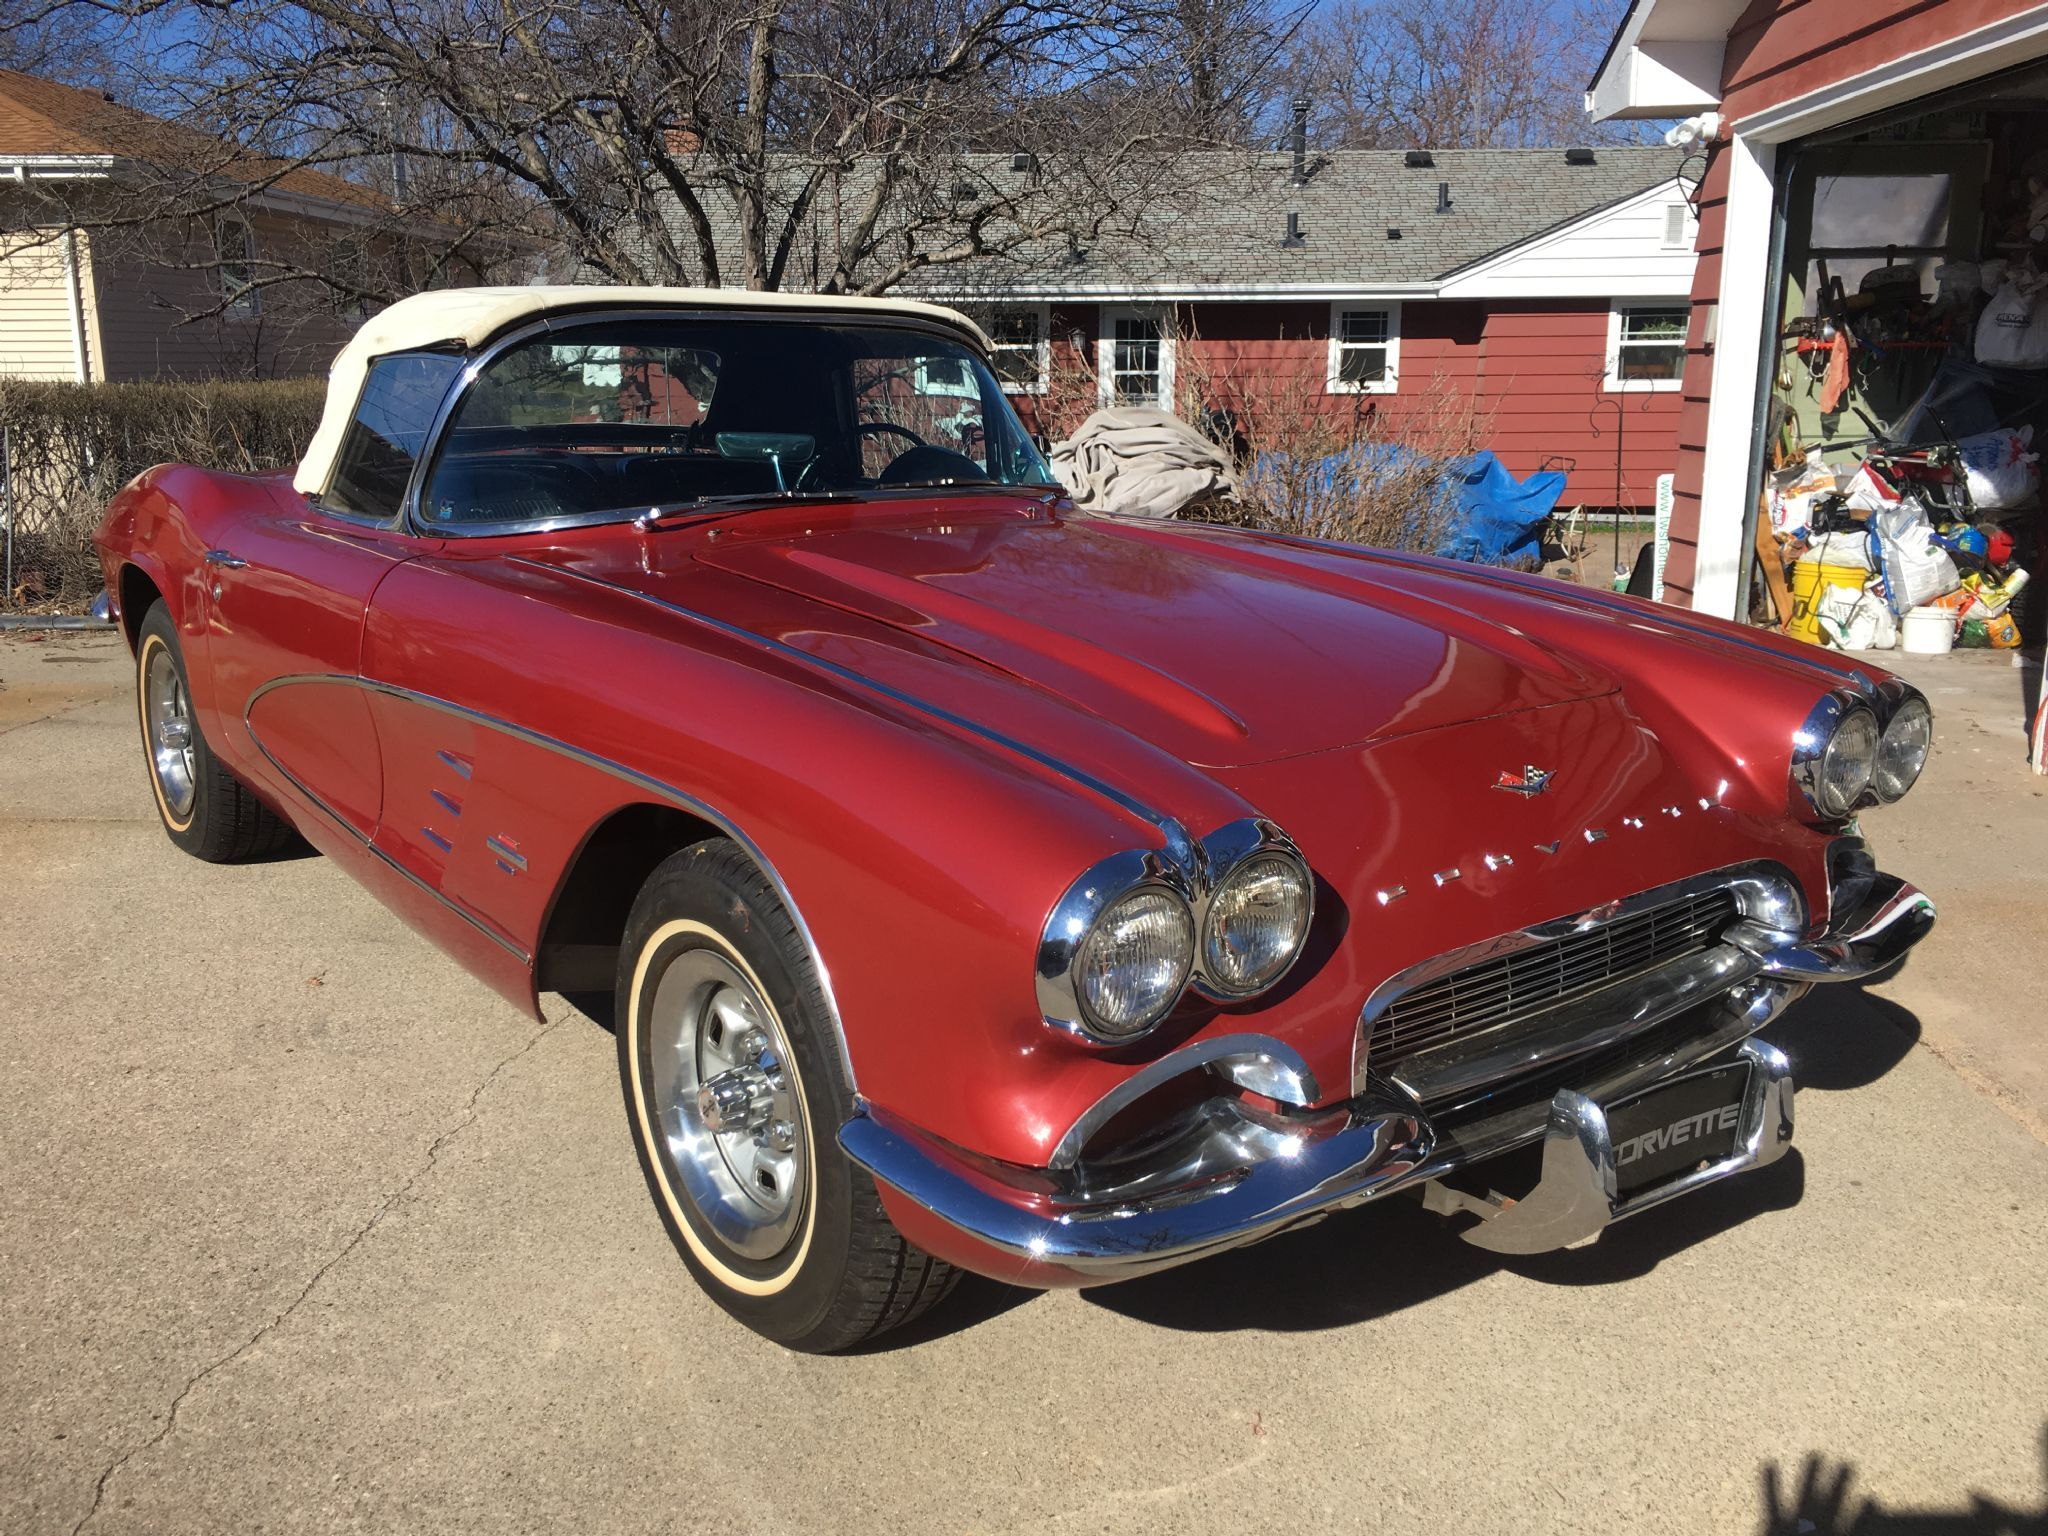 1961 Chevrolet Corvette For Sale Allcollectorcars Com In 2020 Chevrolet Corvette Chevrolet Corvette For Sale